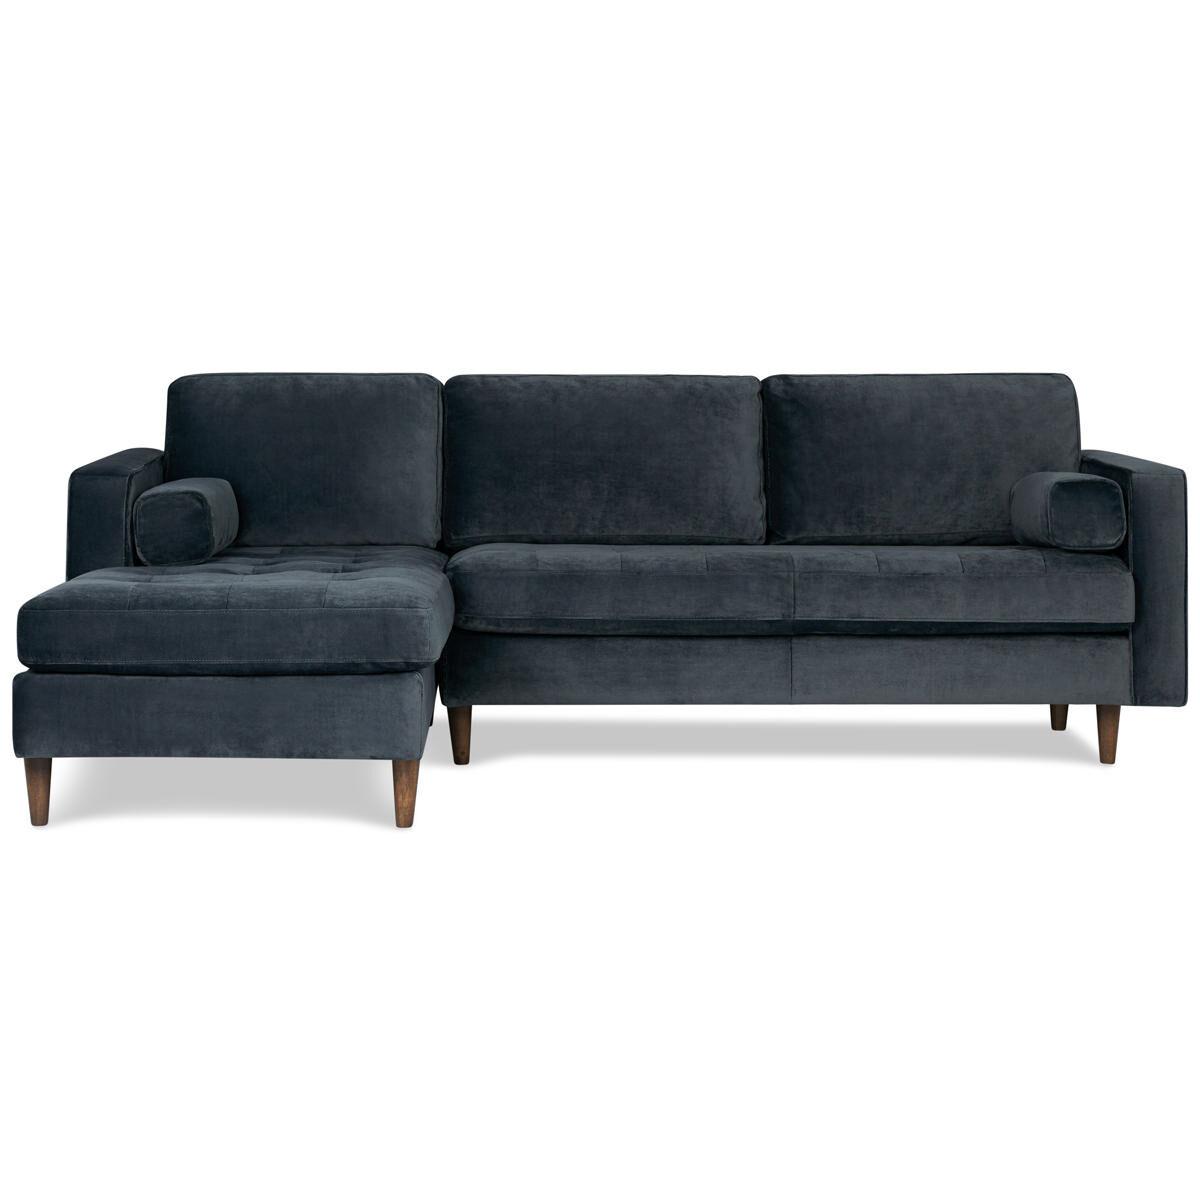 marco gray chaise sofa round settee sofas reynolds gala steel